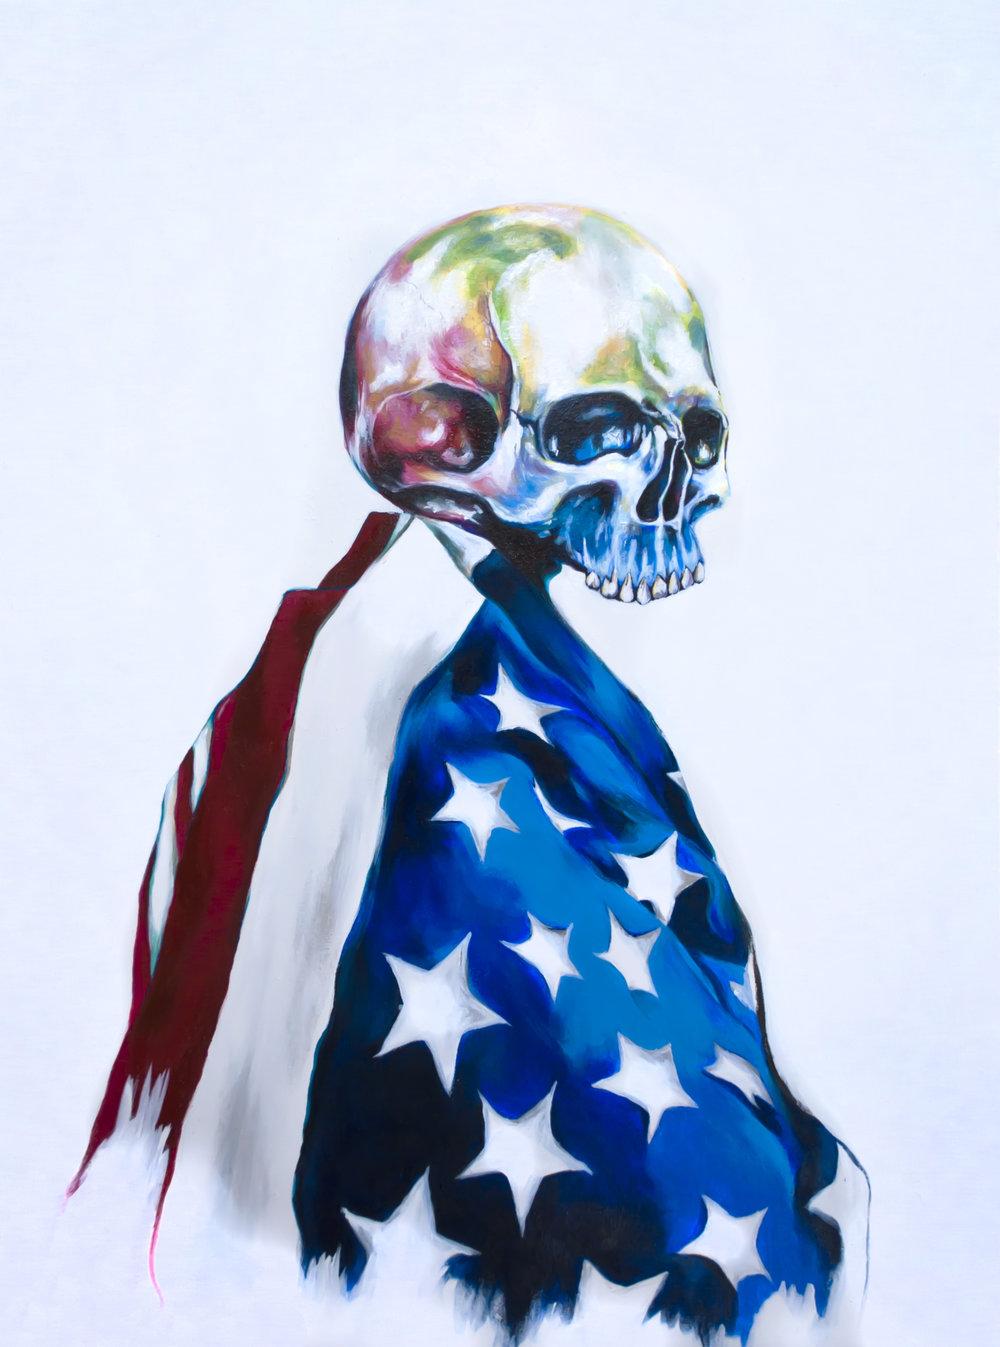 Paco Irogoyen -- Loss of American Values